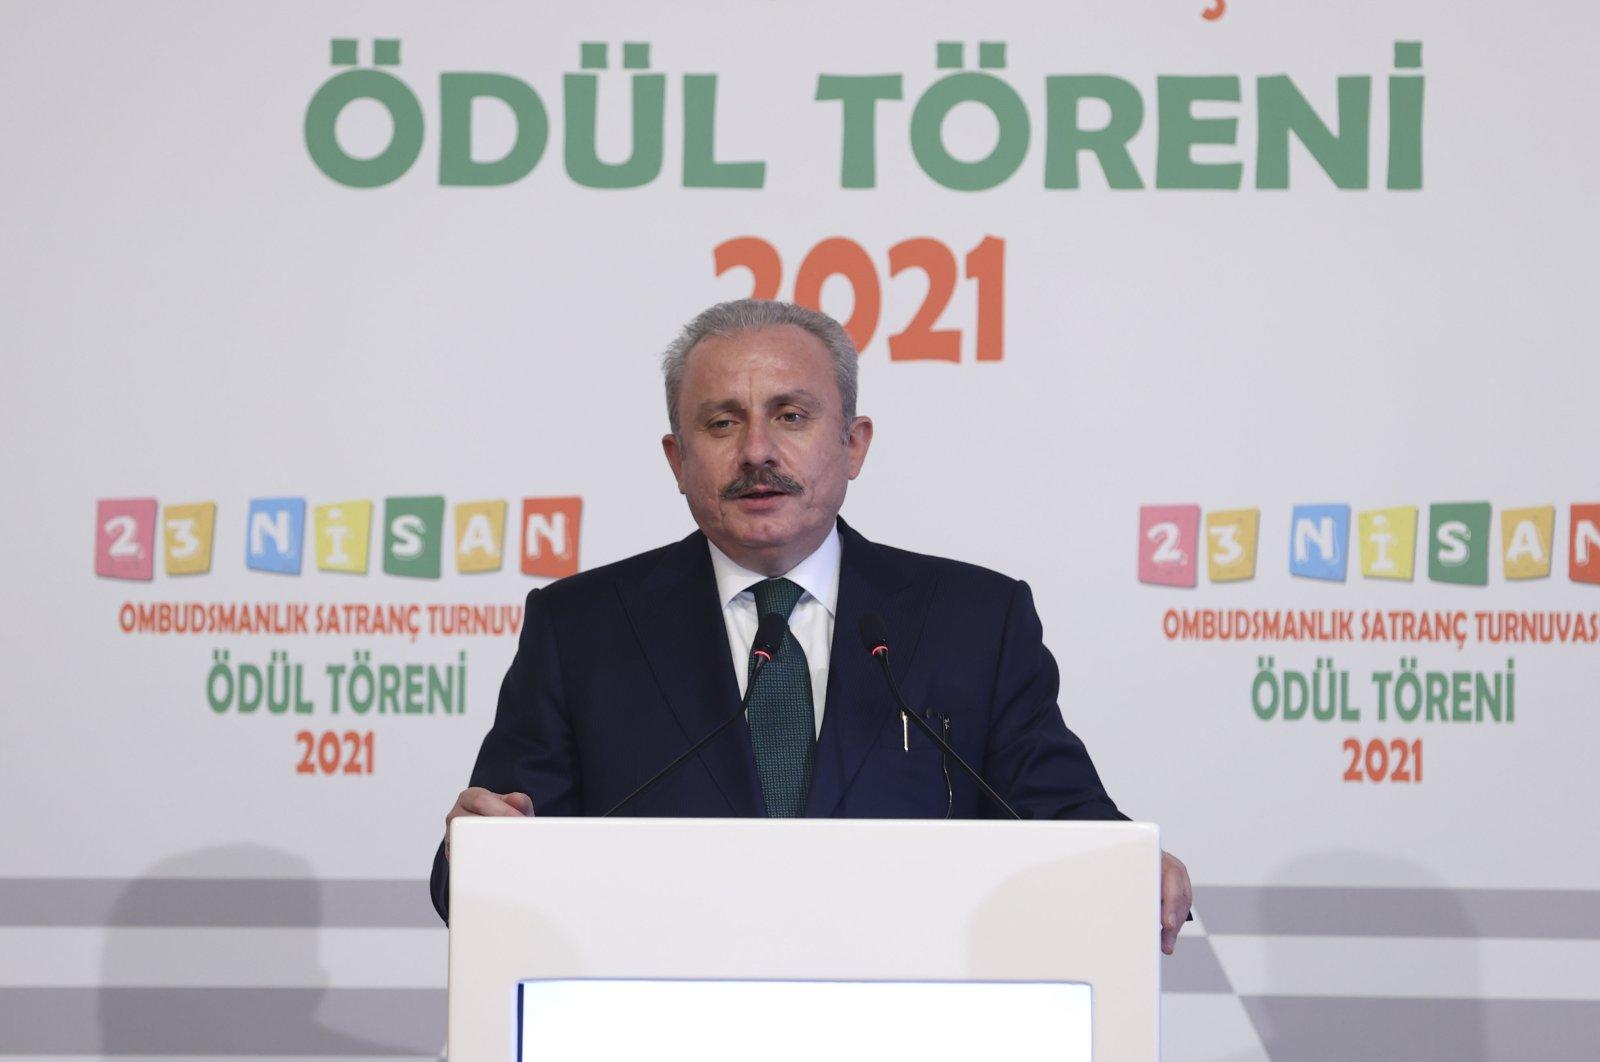 Turkey's Parliament Speaker Mustafa Şentop speaks at an event in the capital Ankara, Turkey, April 29, 2021. (AA Photo)